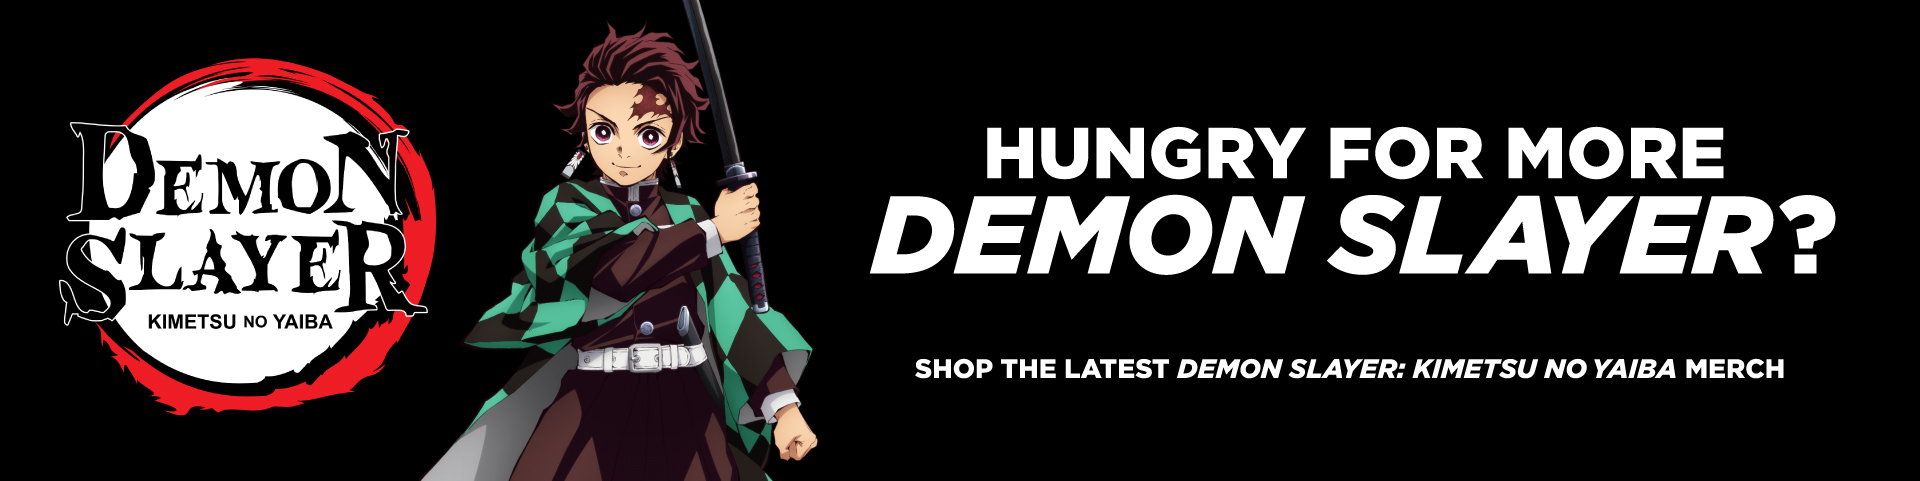 Hungry For More Demon Slayer? Shop the Latest Demon Slayer: Kimetsu No Yaiba Merch